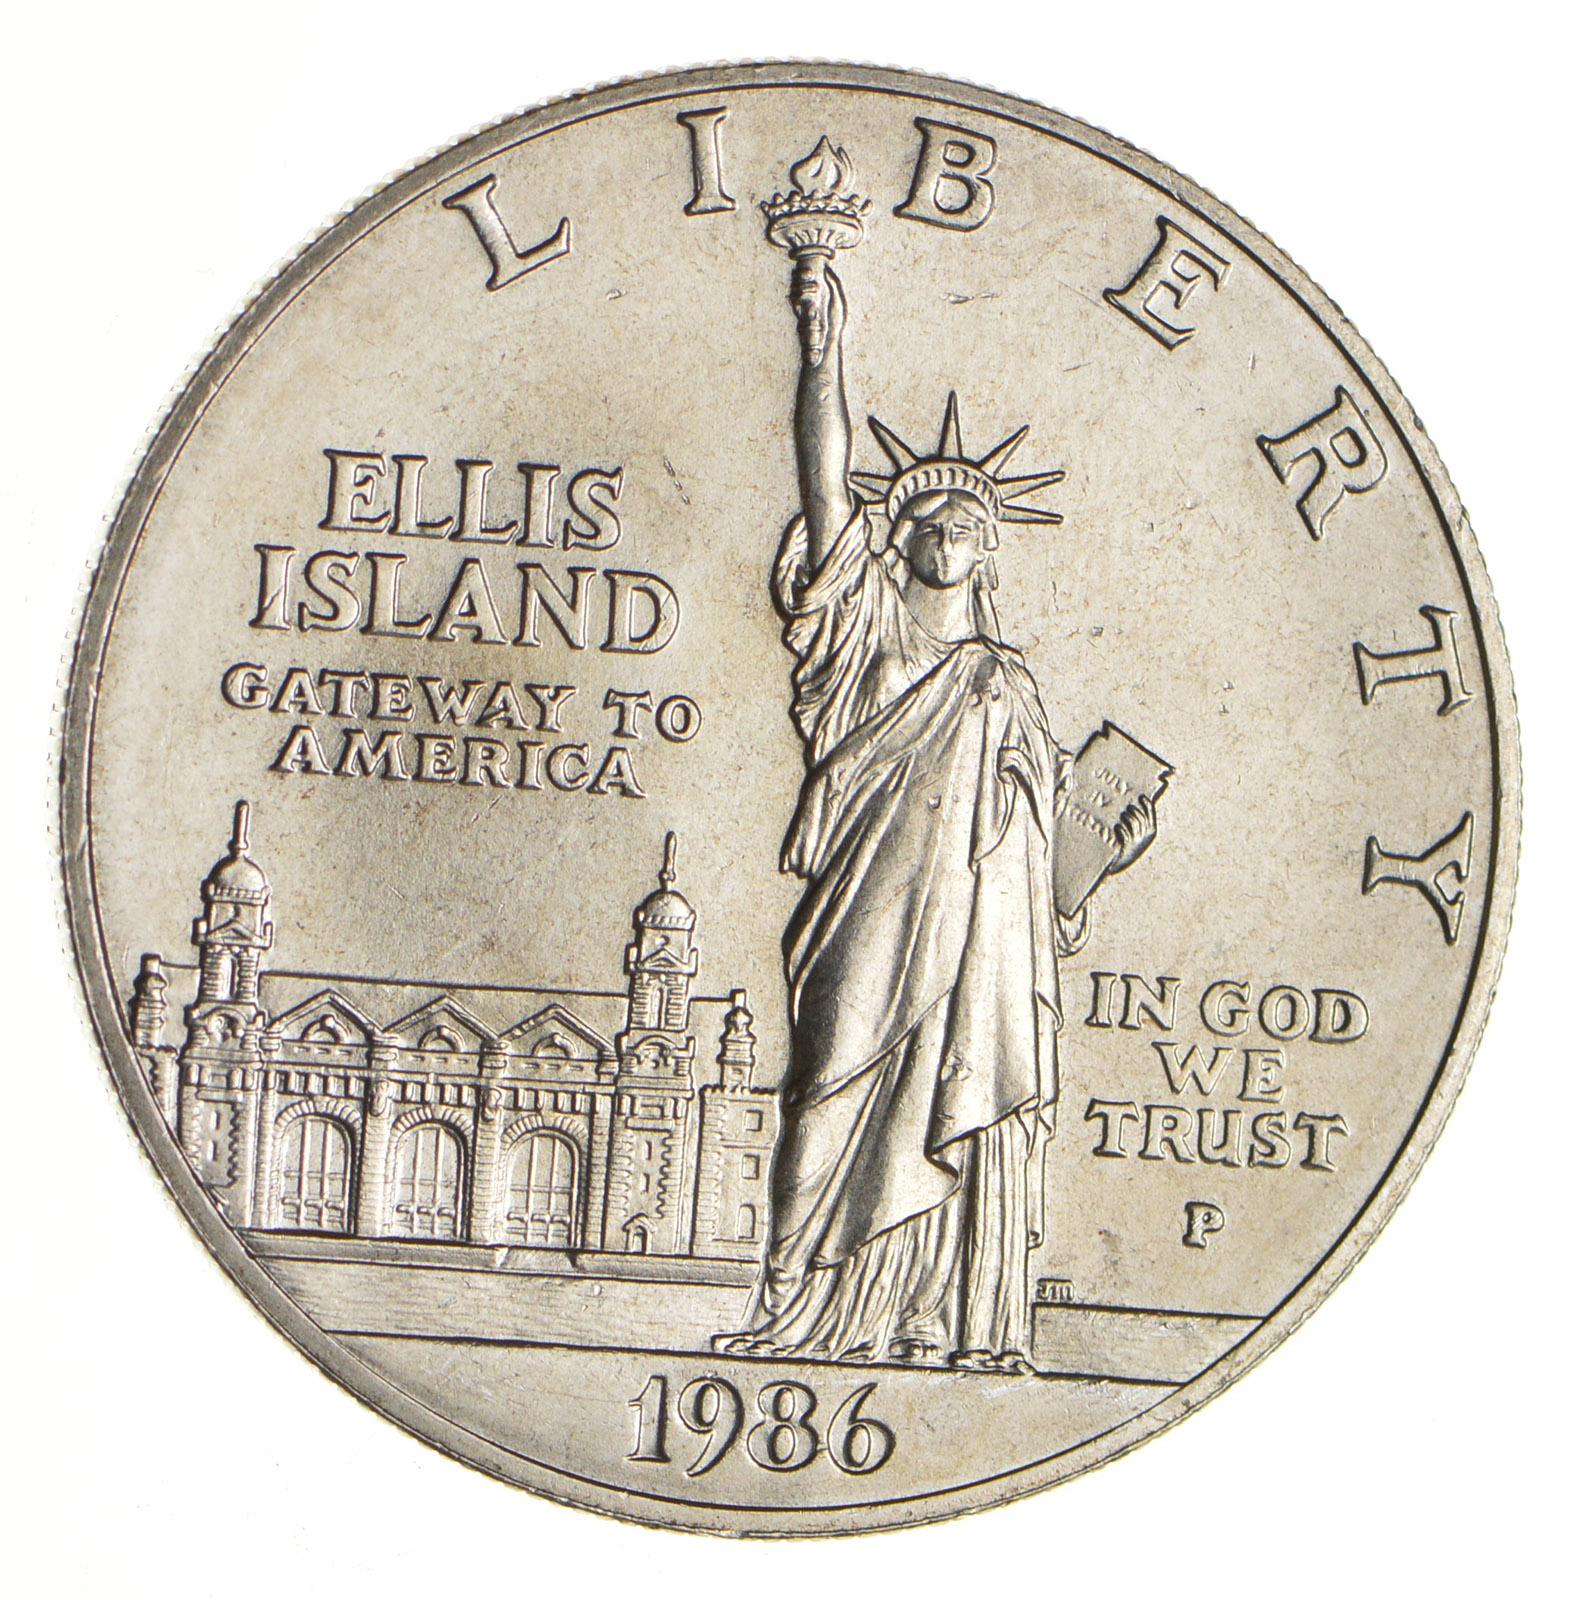 1986 Statue of Liberty Centennial Commemorative Proof 90/% Silver Dollar